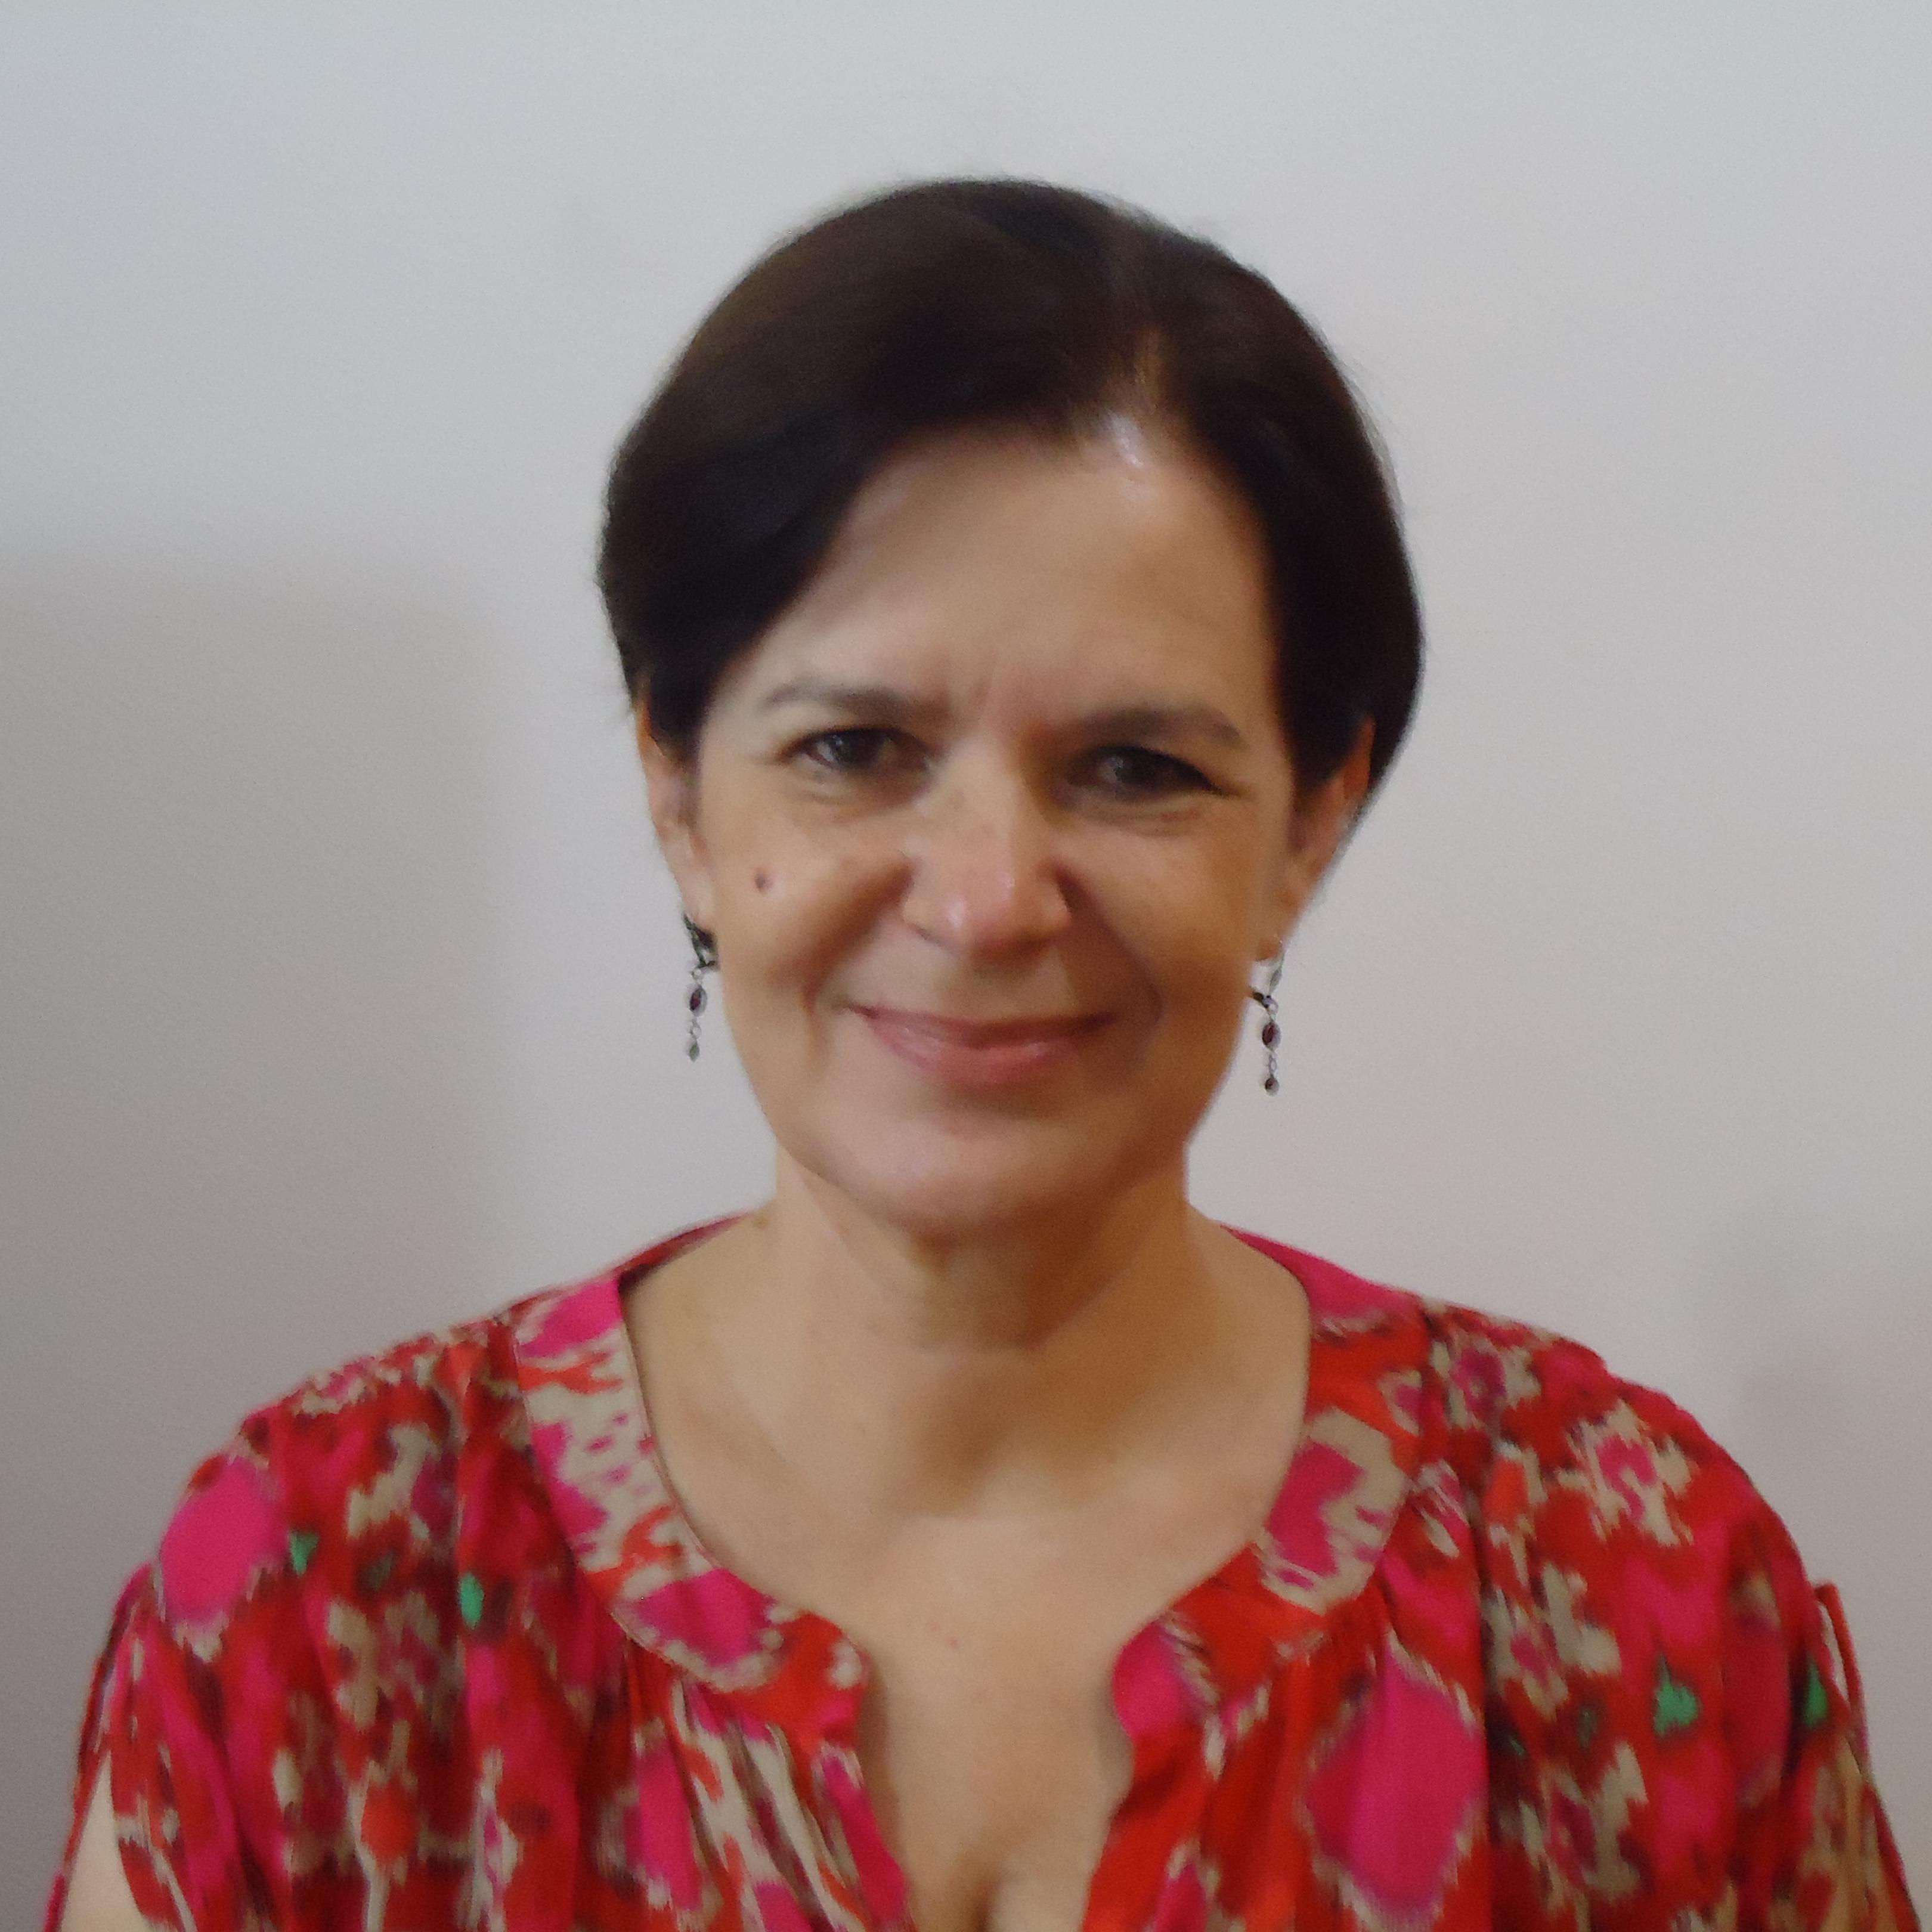 Nadja Nara Barbosa Pinheiro